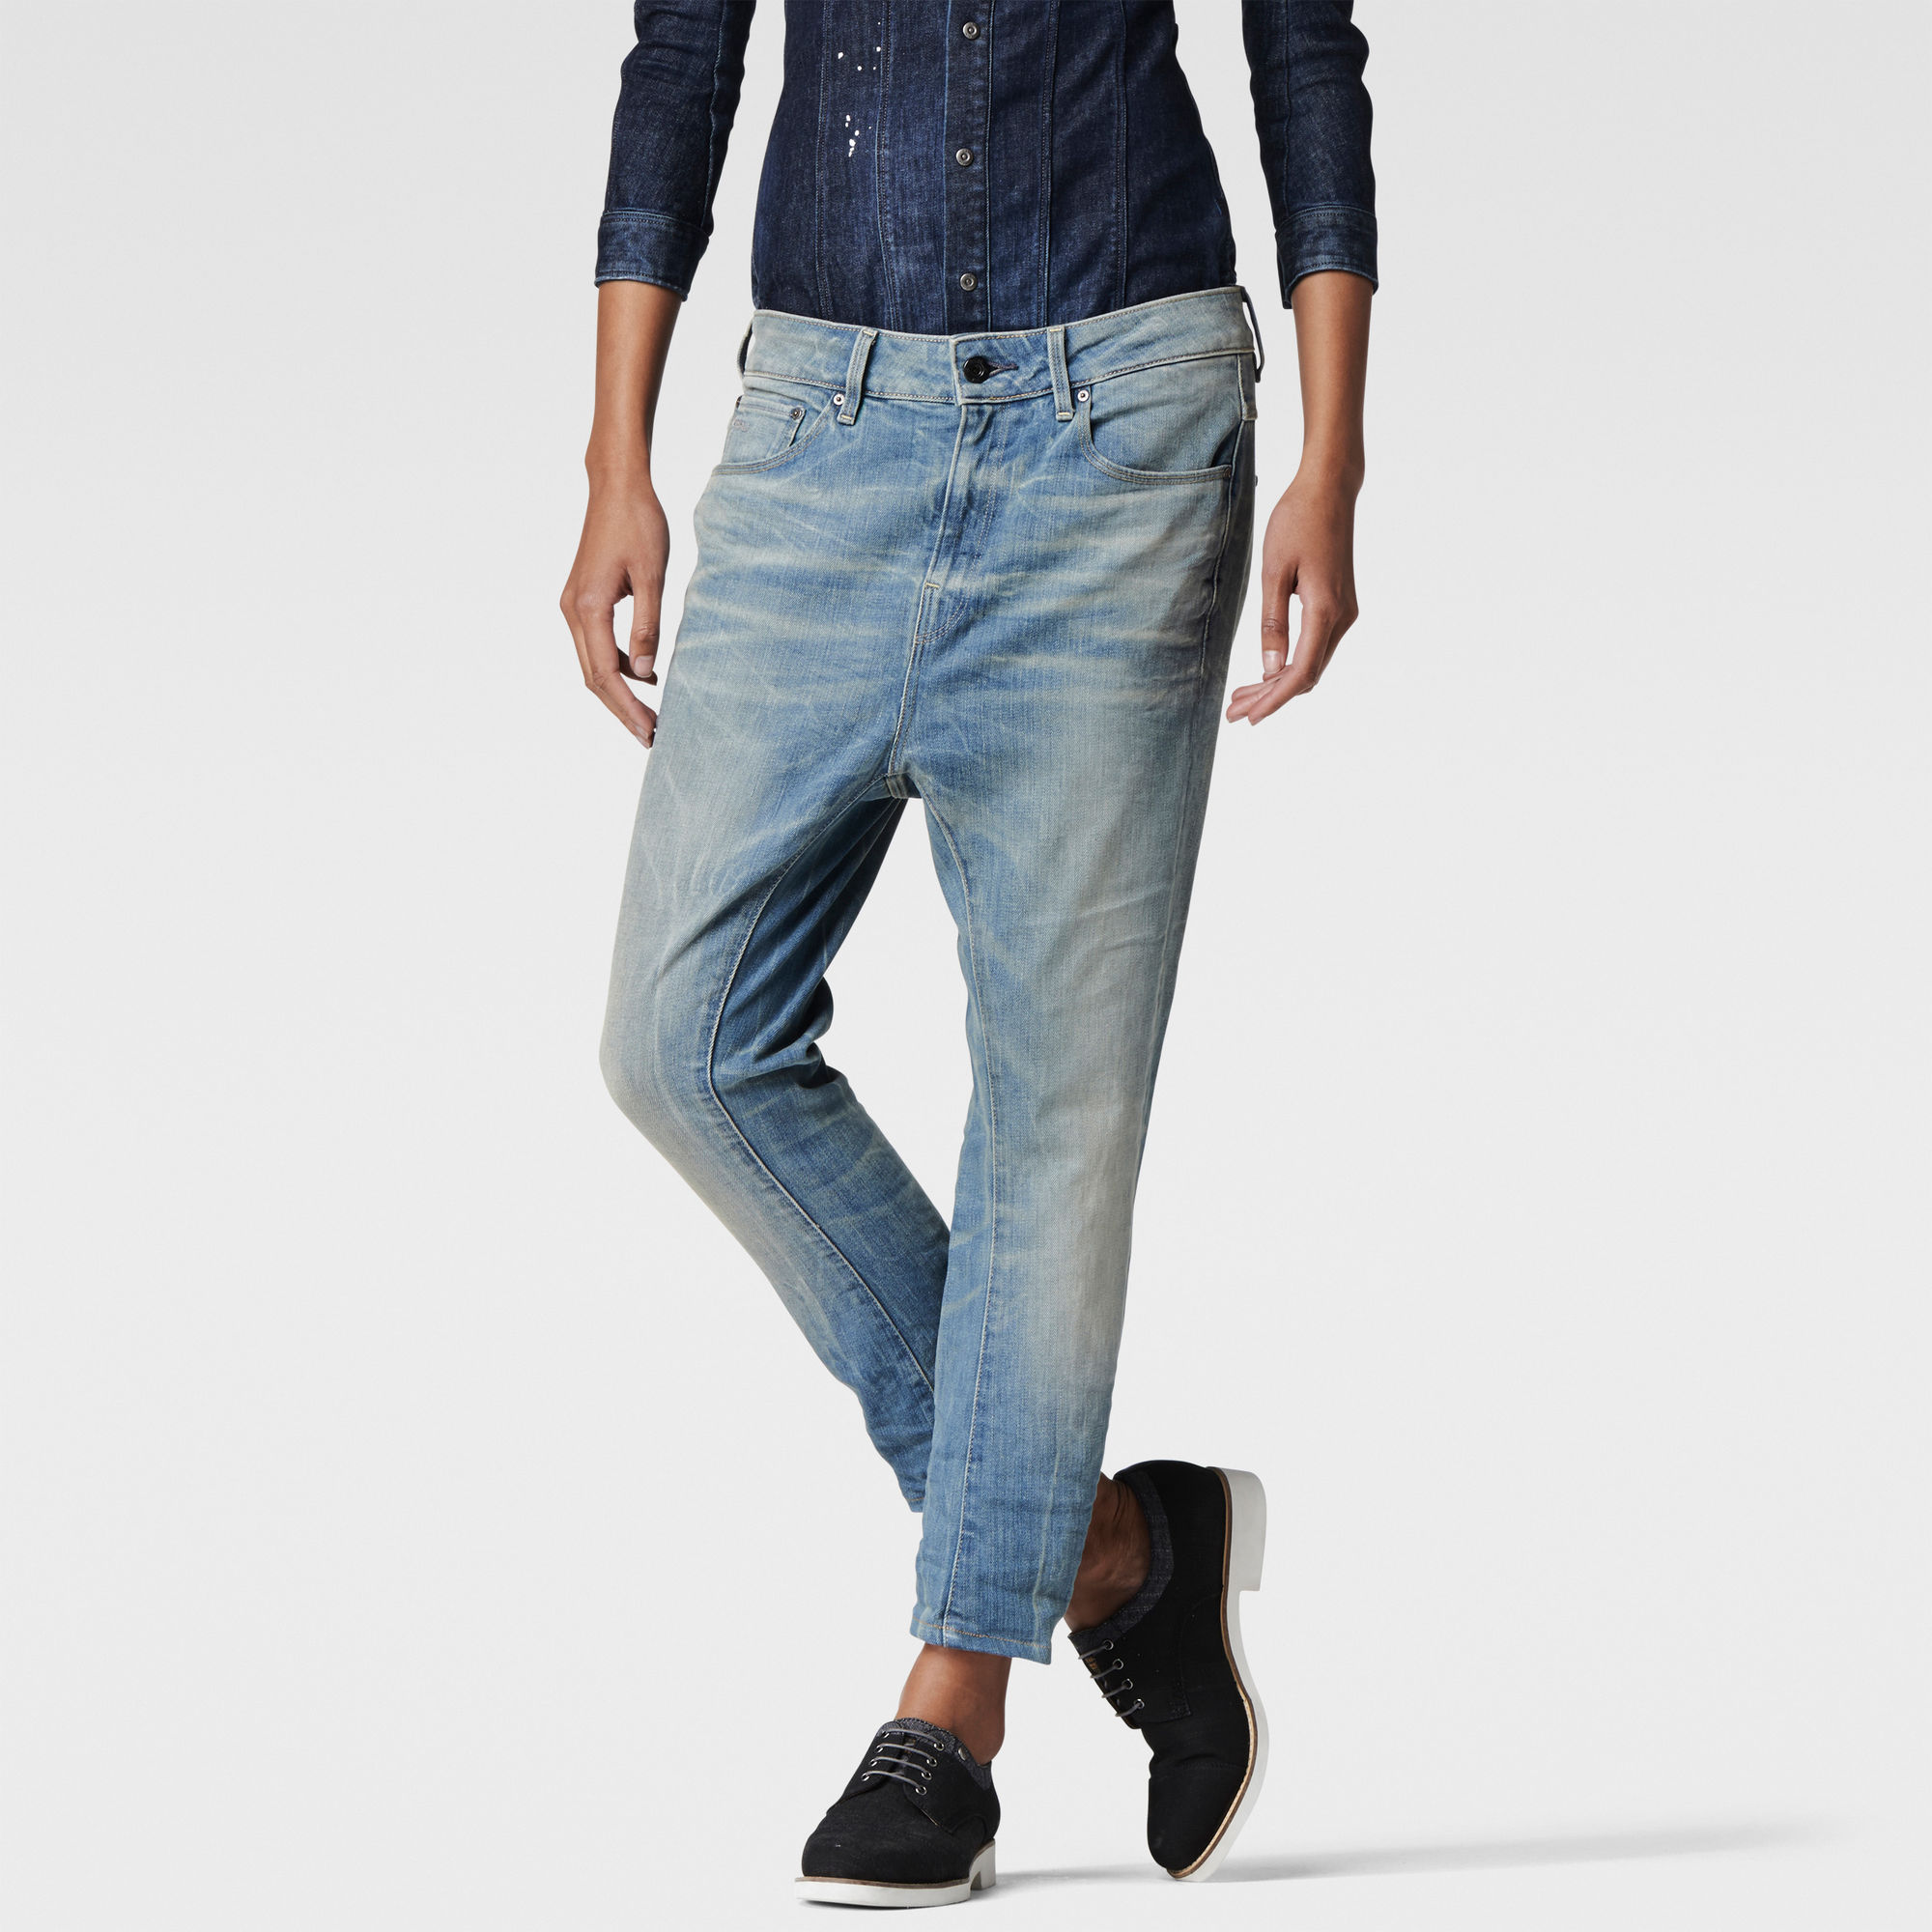 Attacc Low Waist Boyfriend Jeans